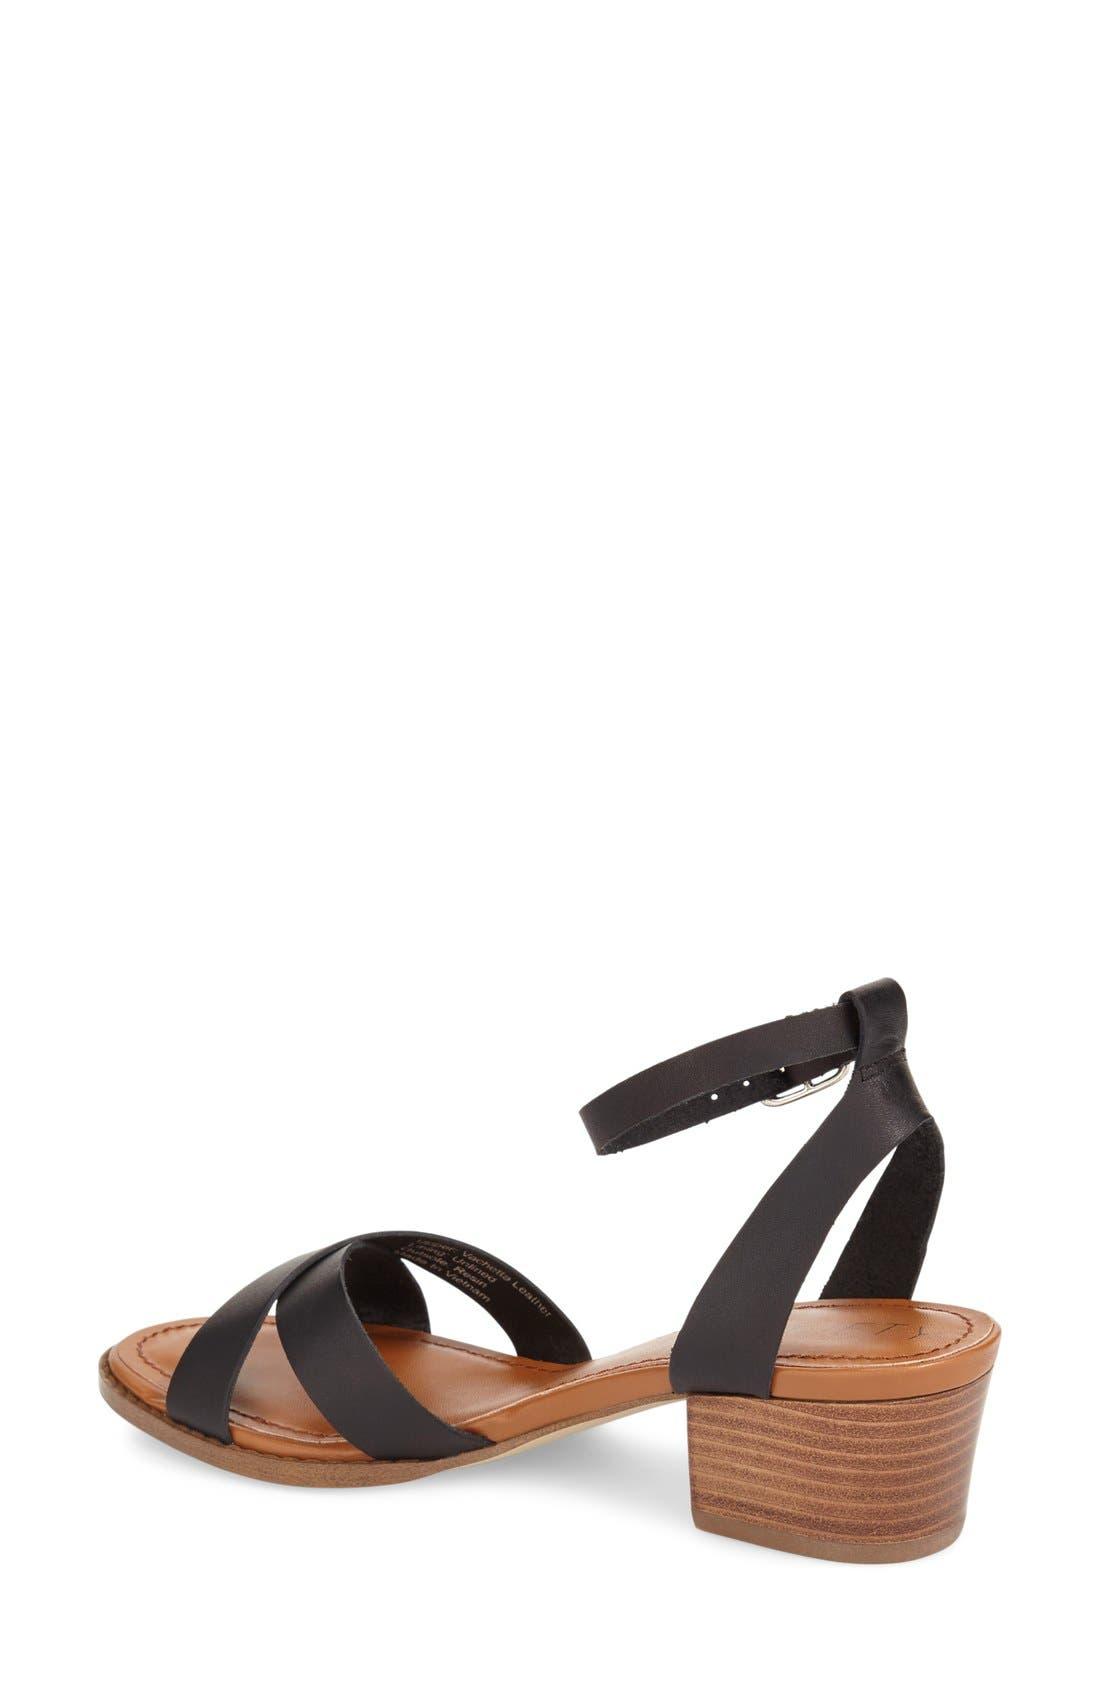 'Savannah' Sandal,                             Alternate thumbnail 2, color,                             Black